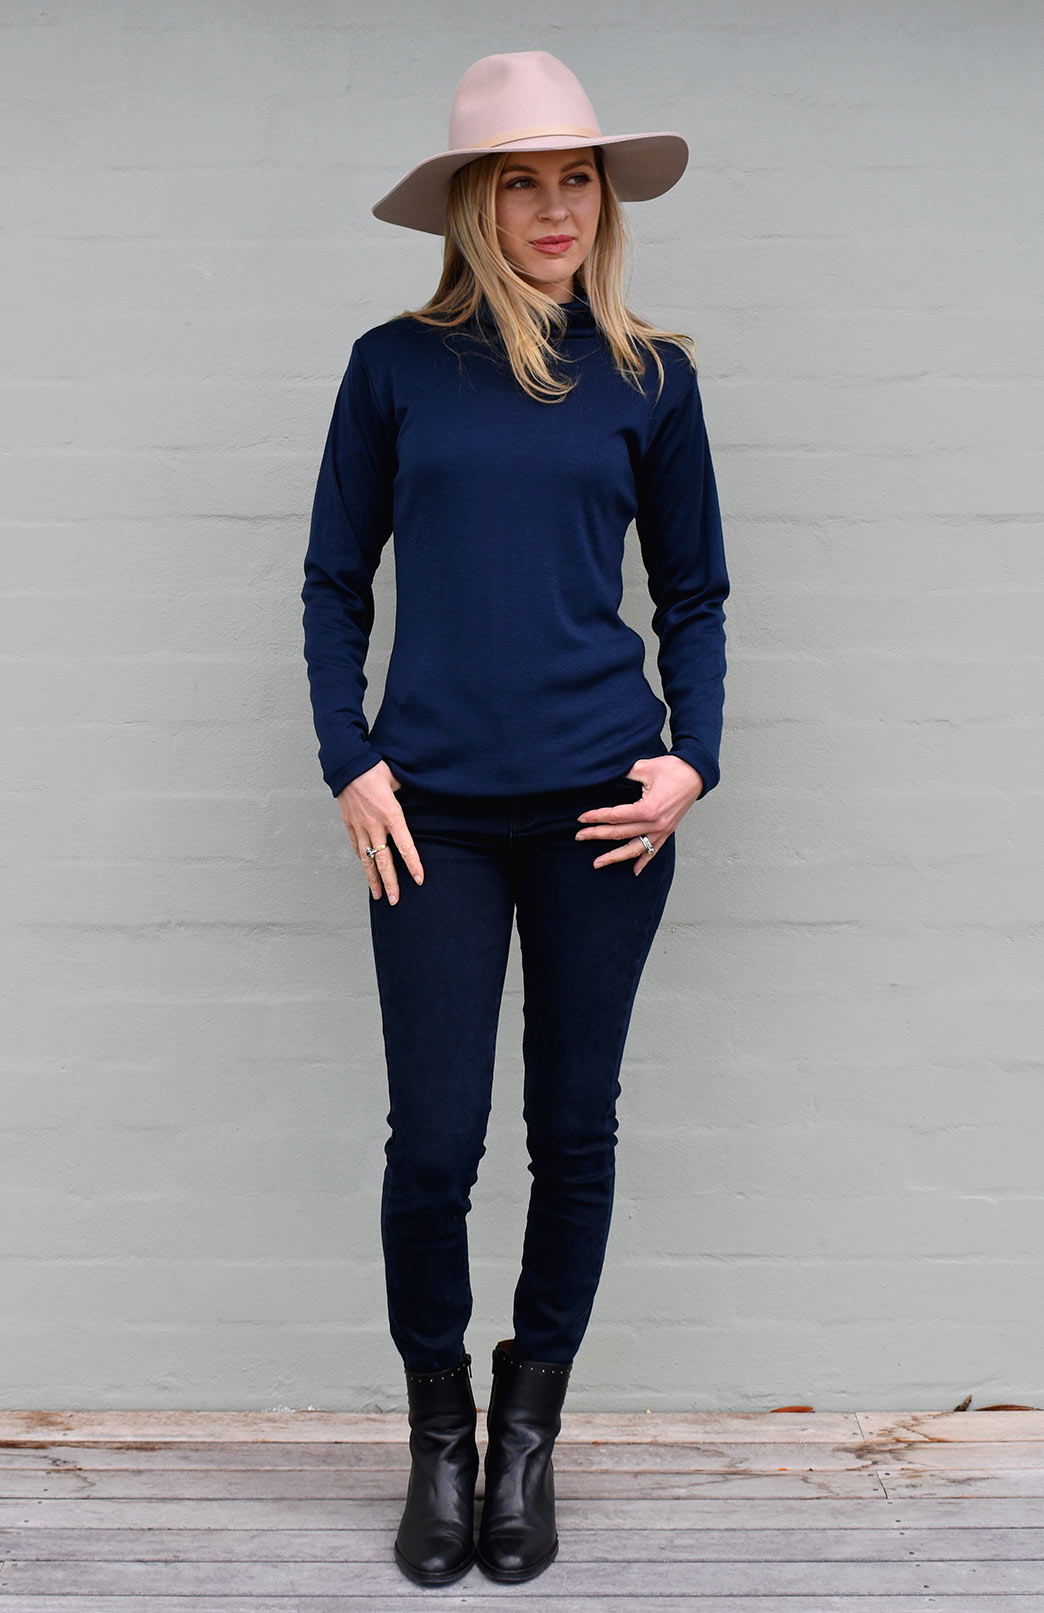 Polo Neck Top - Women's Ink Blue Wool Long Sleeved Polo Neck Top - Smitten Merino Tasmania Australia